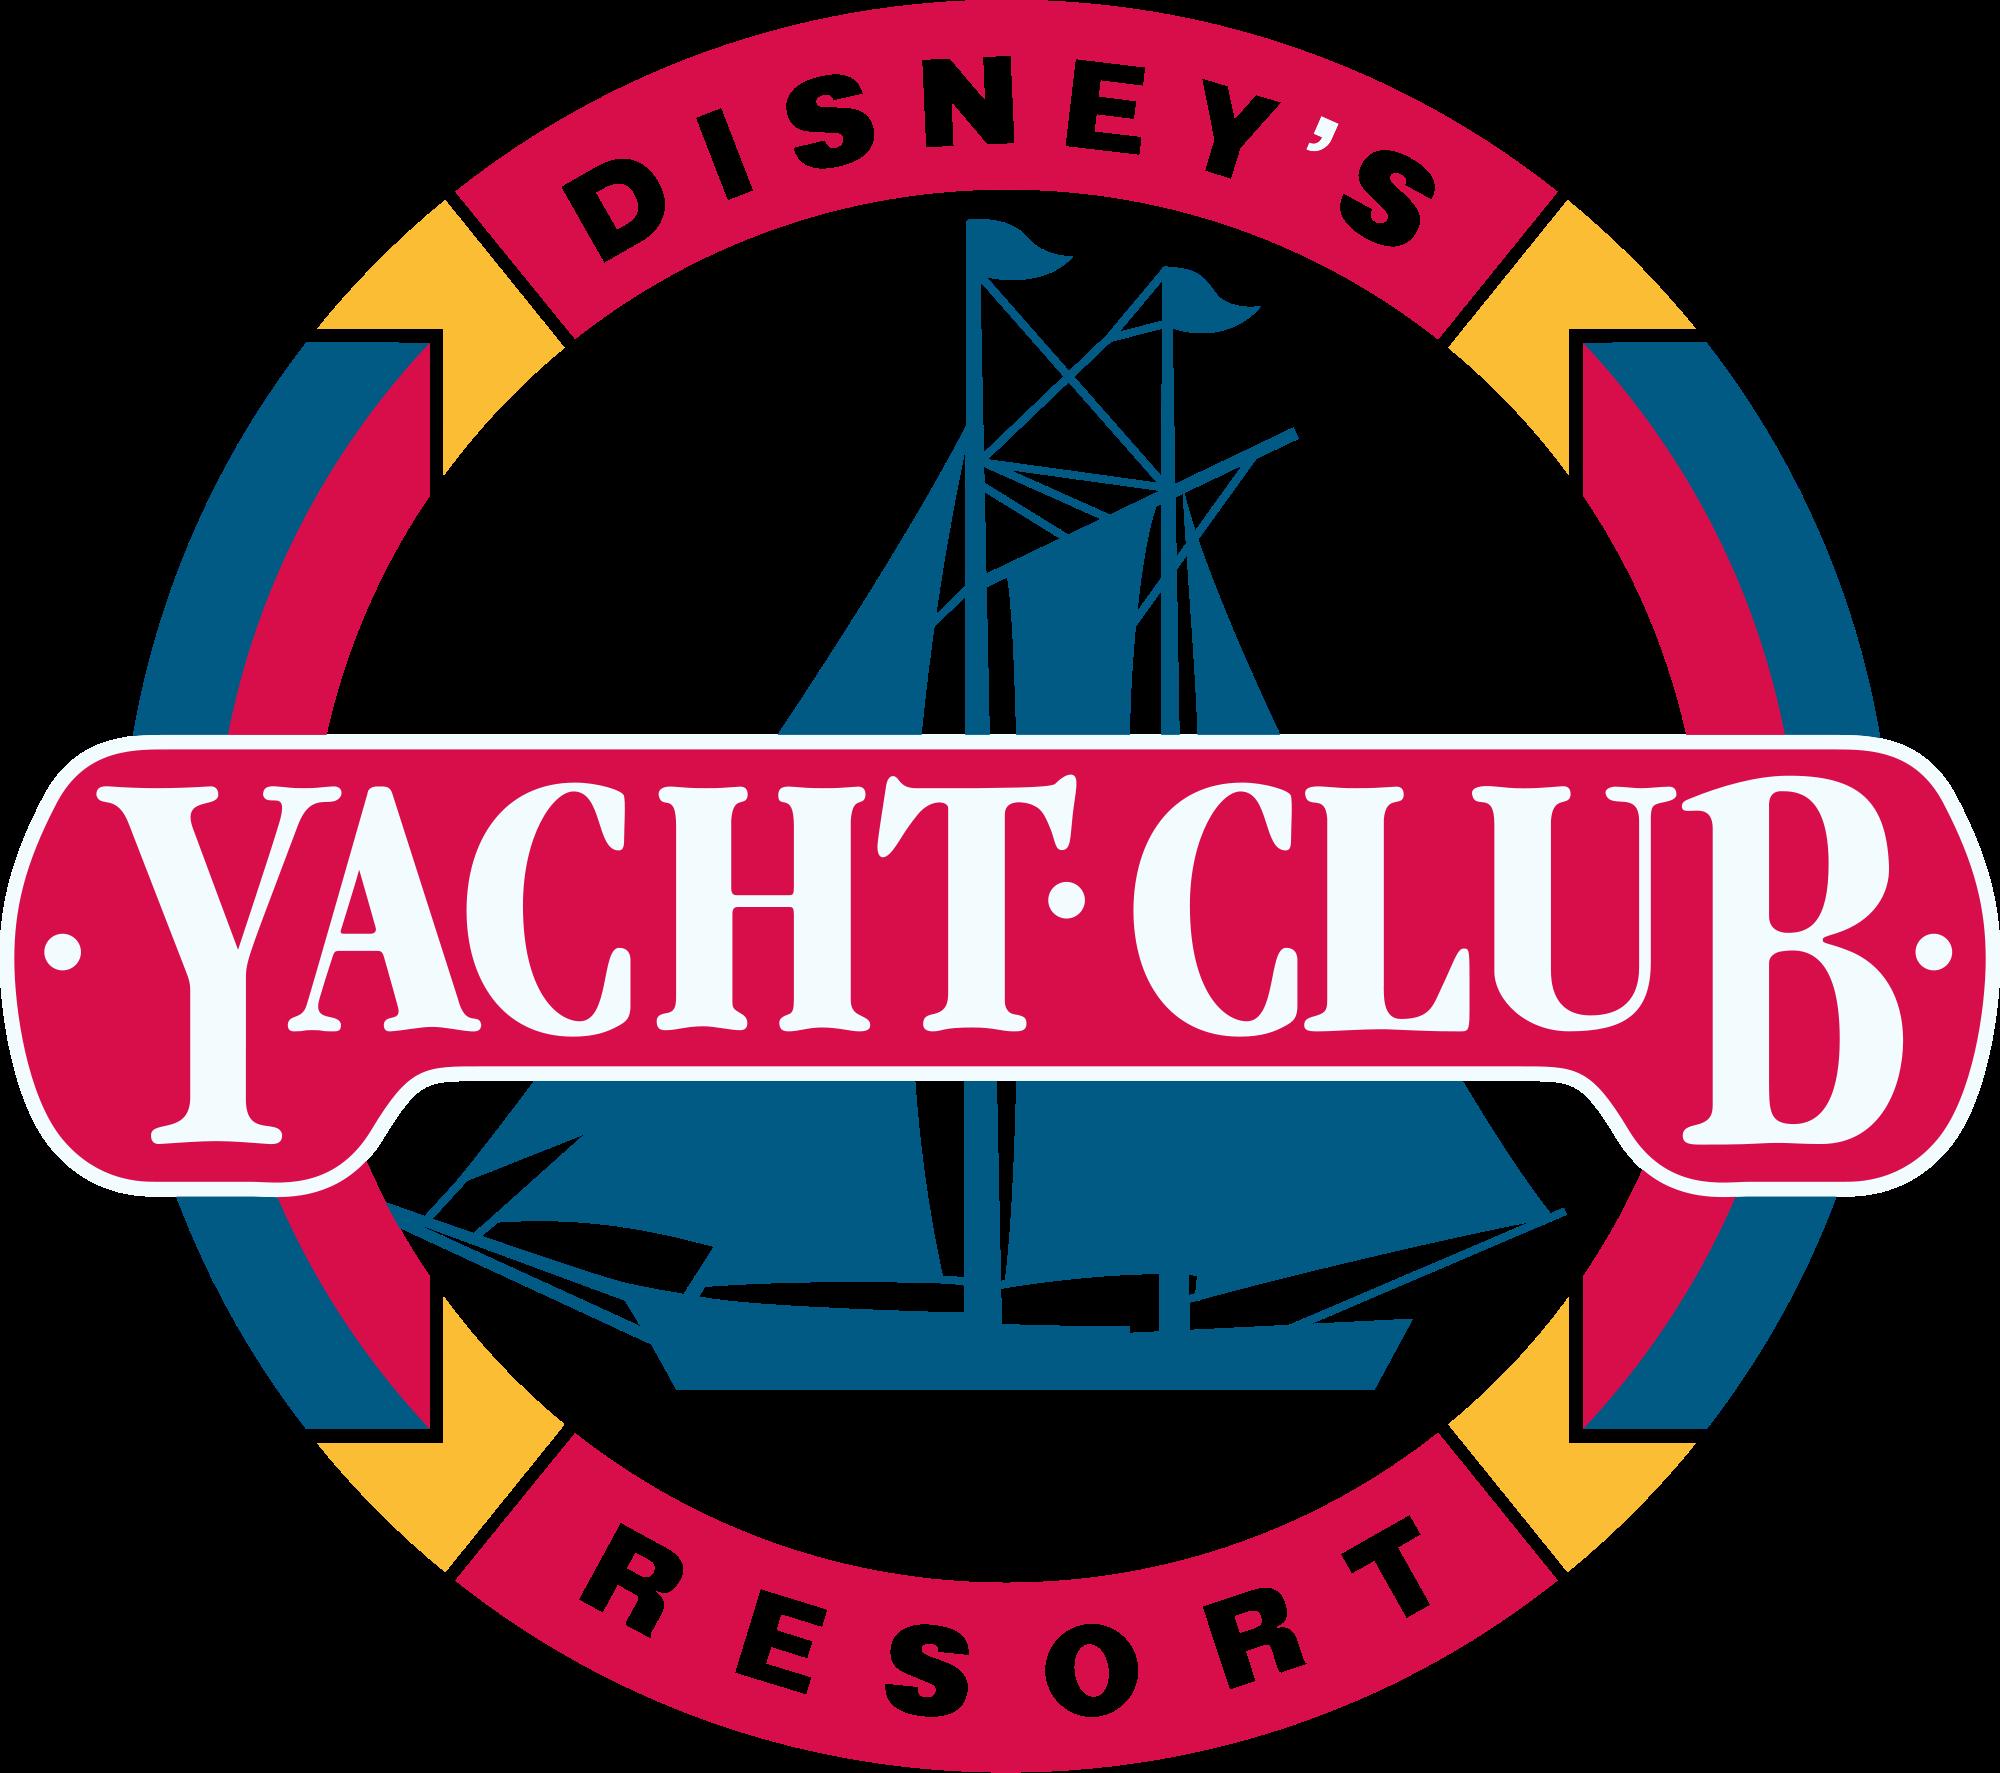 Disney s yacht club. Disneyland clipart emblem